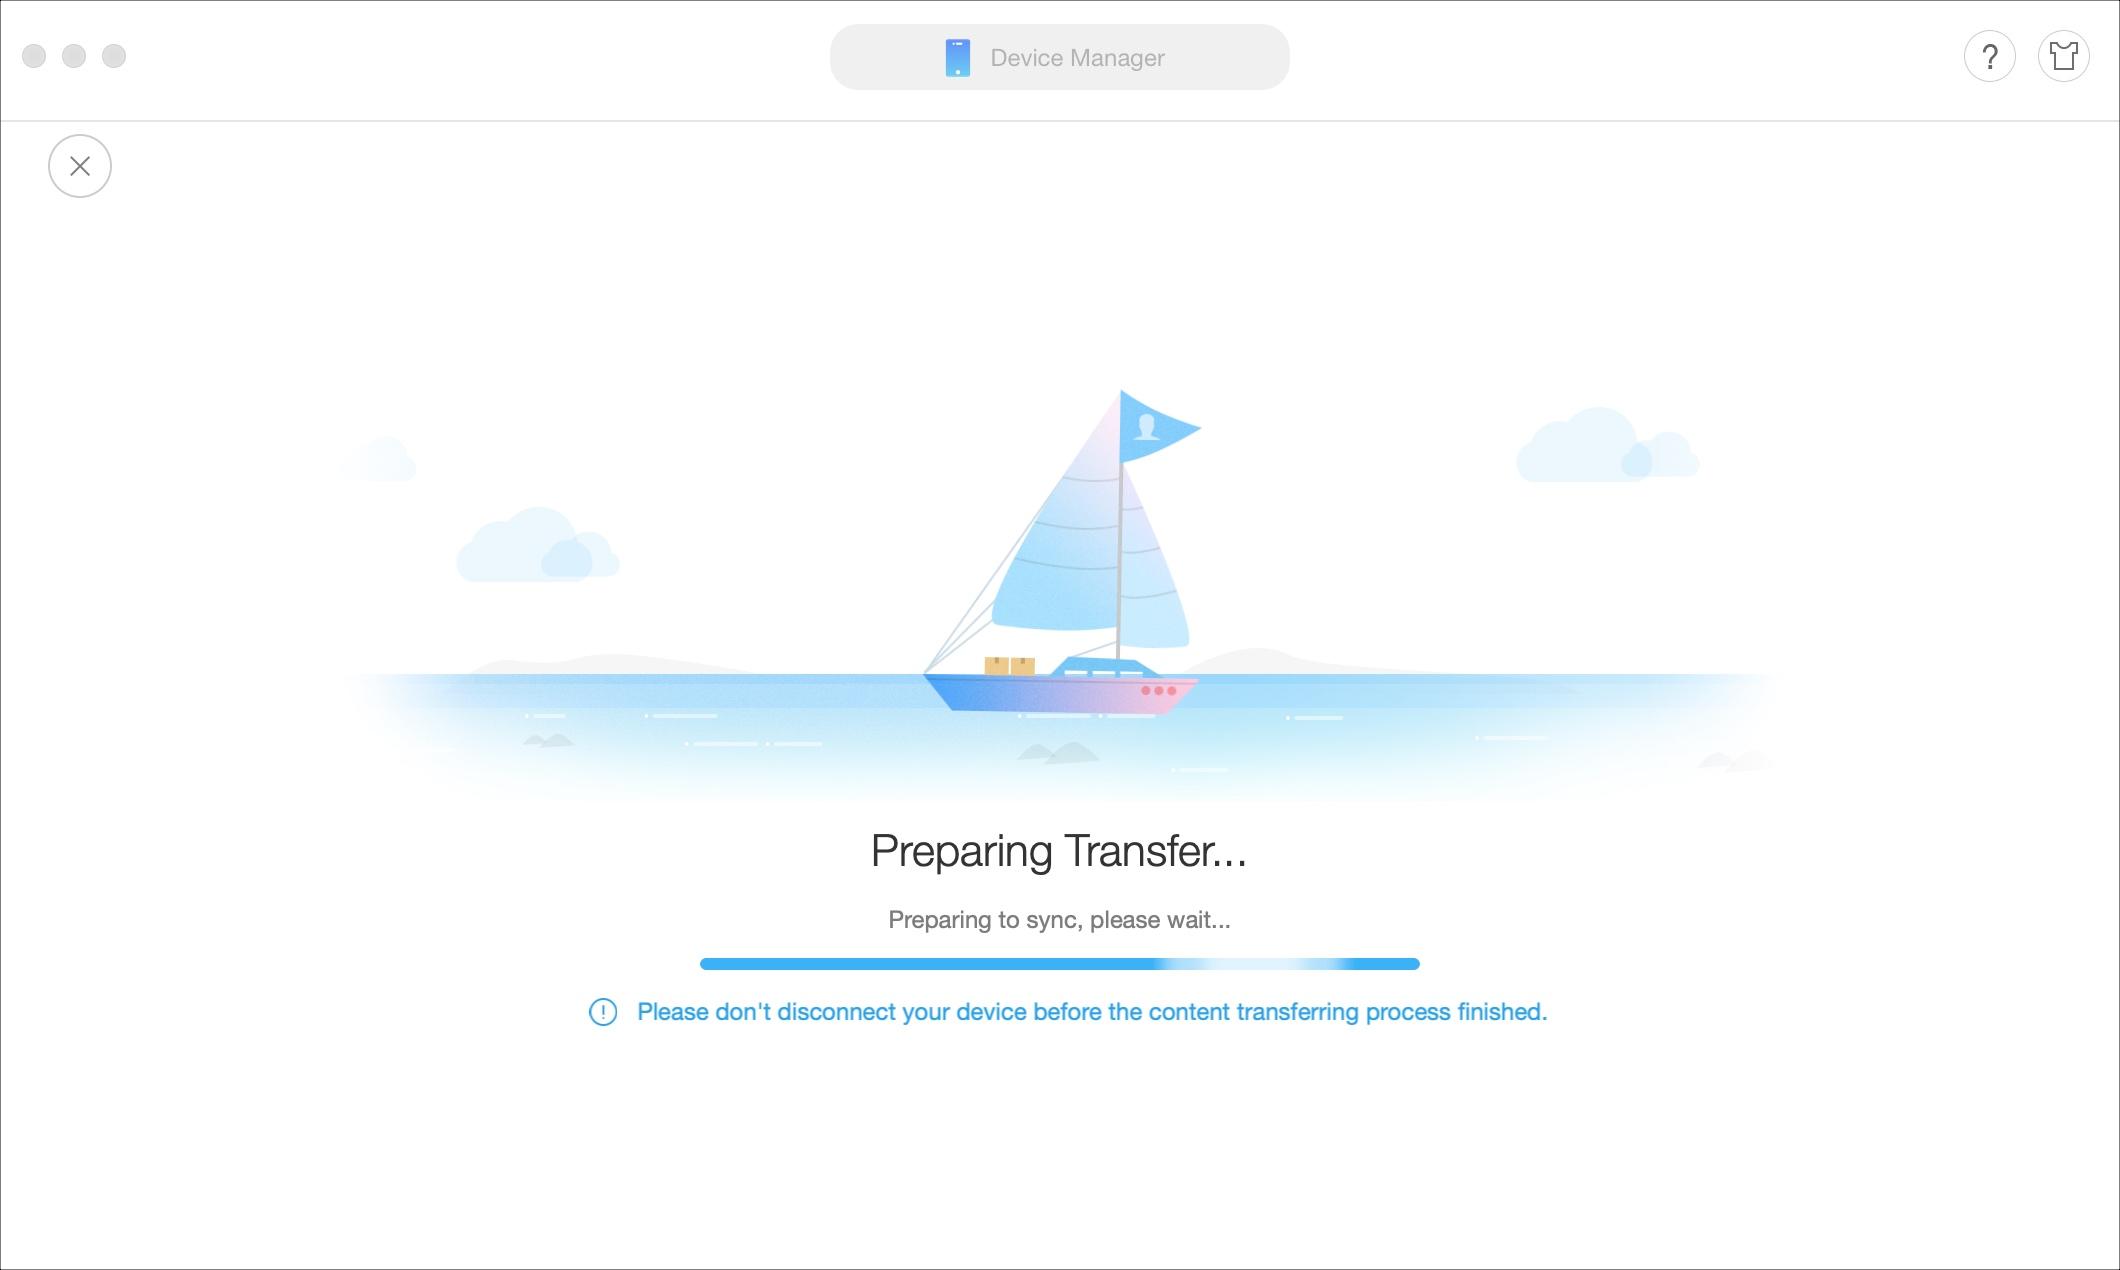 AnyTrans Preparing Transfer